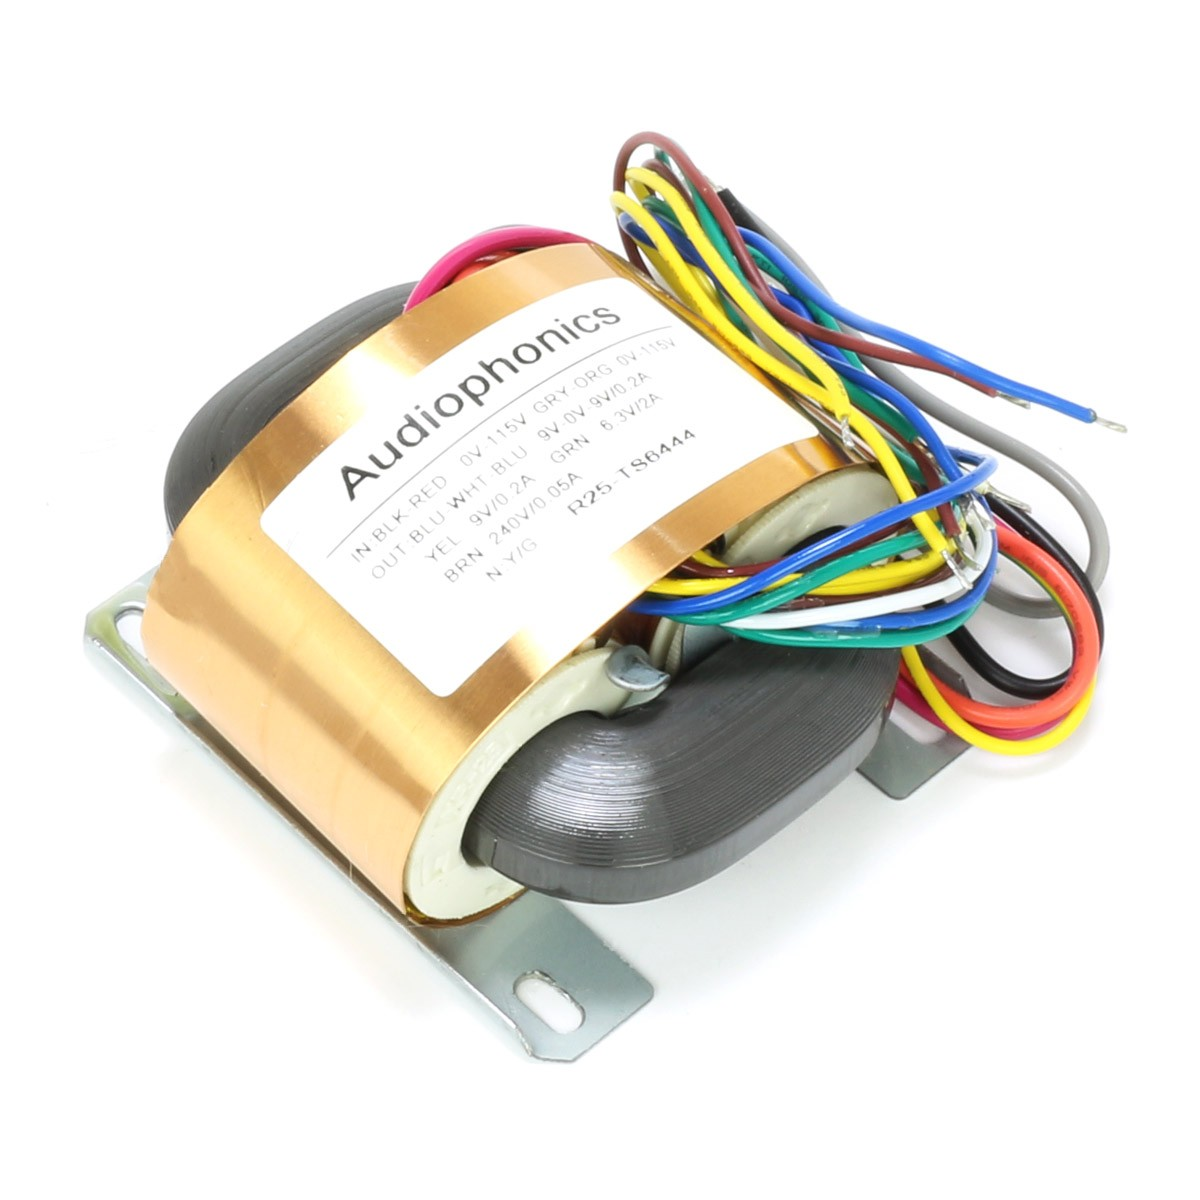 Transformateur R-CORE 30VA 9V-0-9V 0.2A + 9V 0.2A + 6.3V 2A + 240V 0.05A